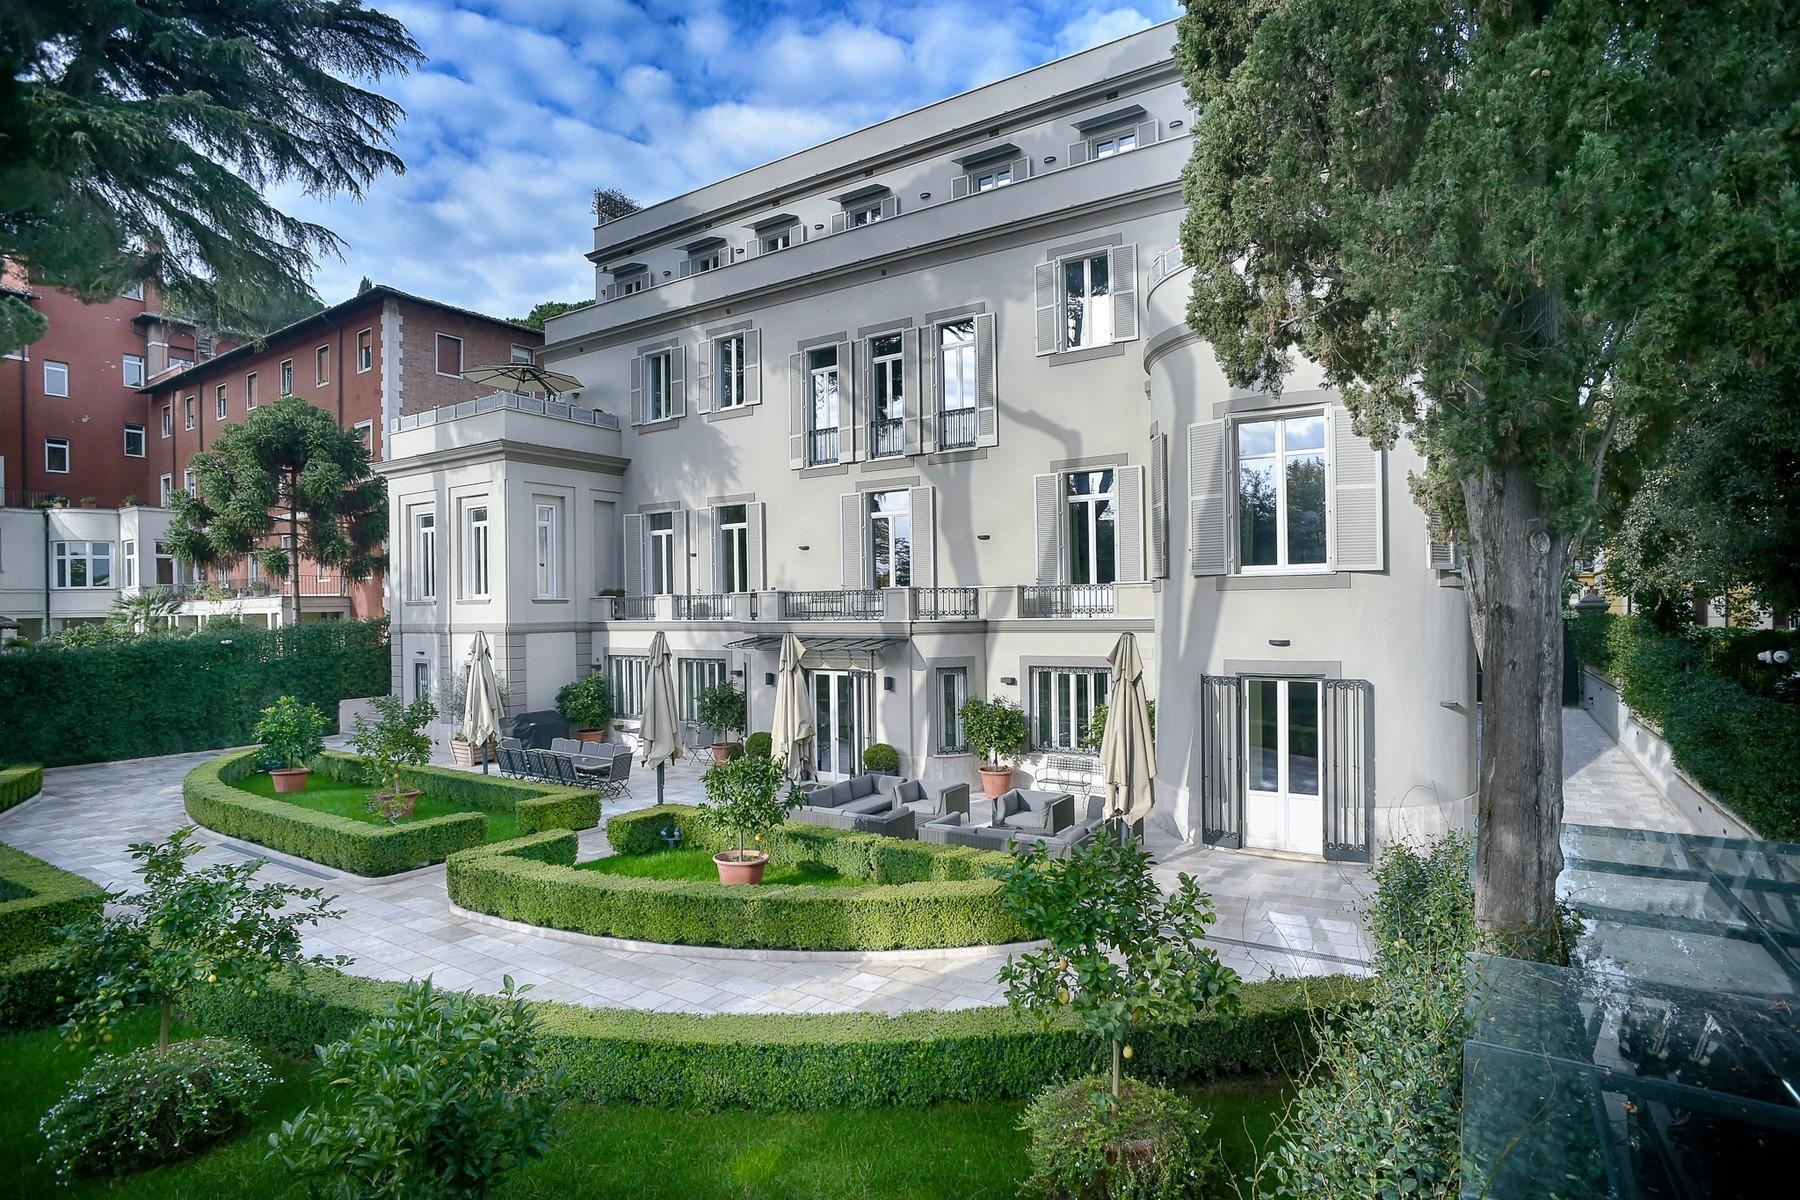 Villa Calandrelli, Charme und Stil im grünen Herzen Roms - 1